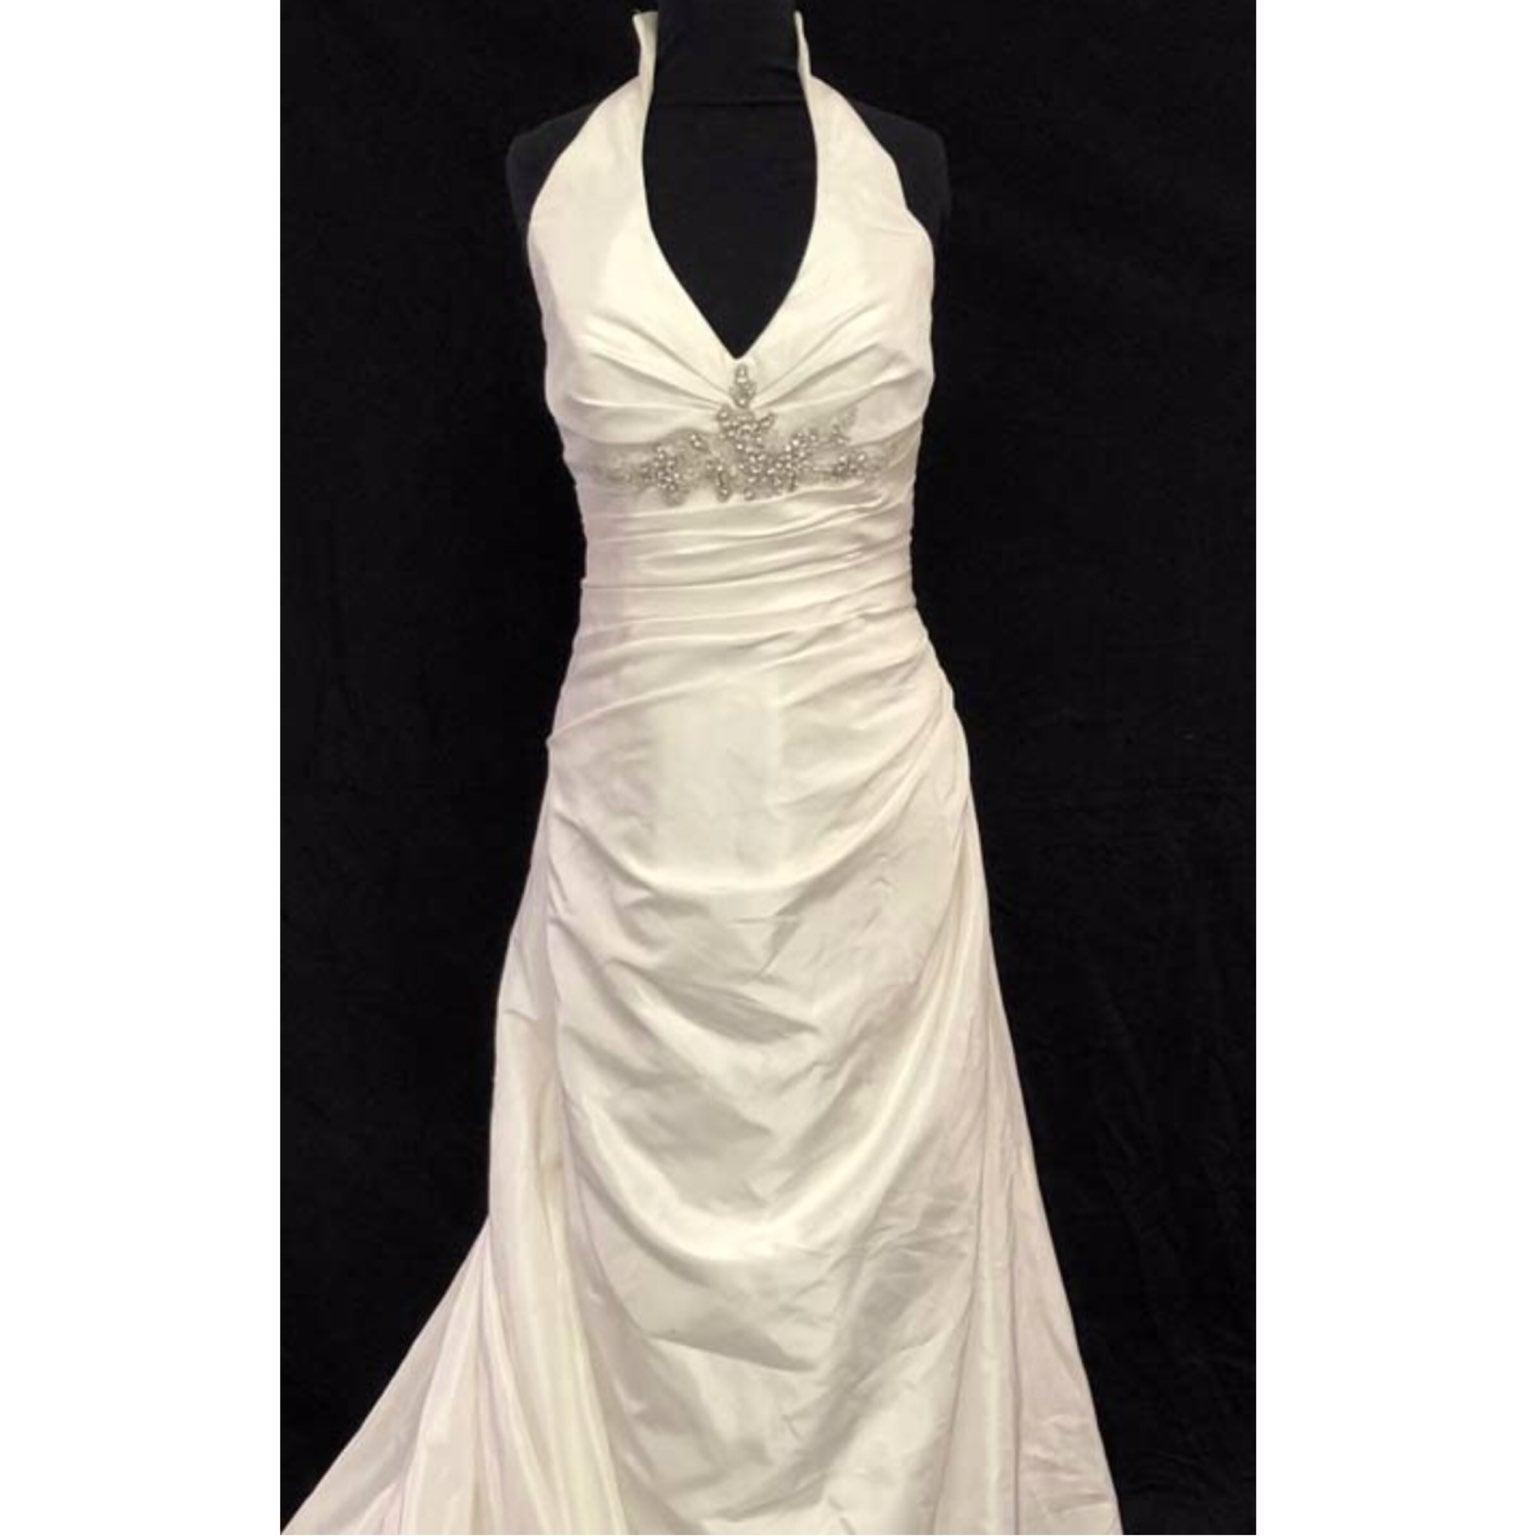 DaVinci Halter Ivory Wedding Dress 18